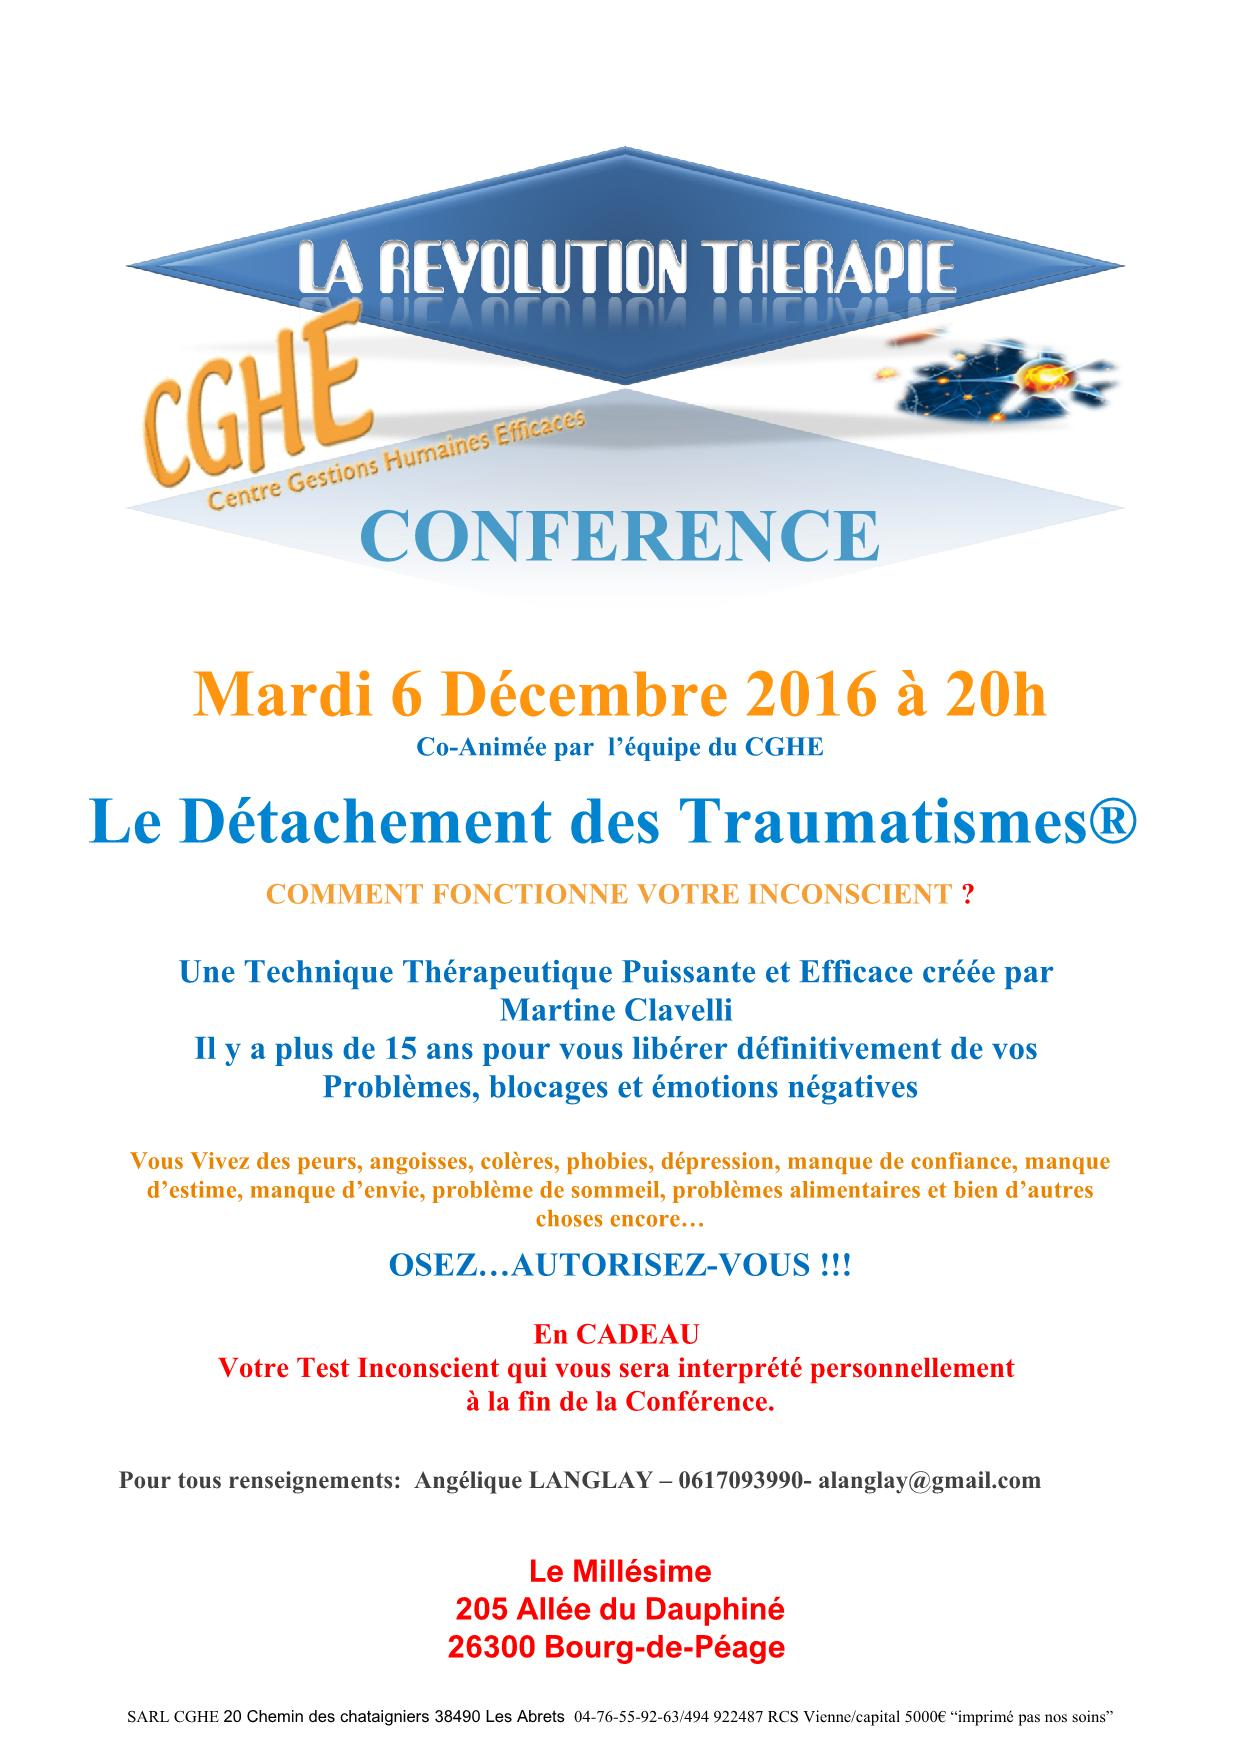 conference-6-decembre-16_1